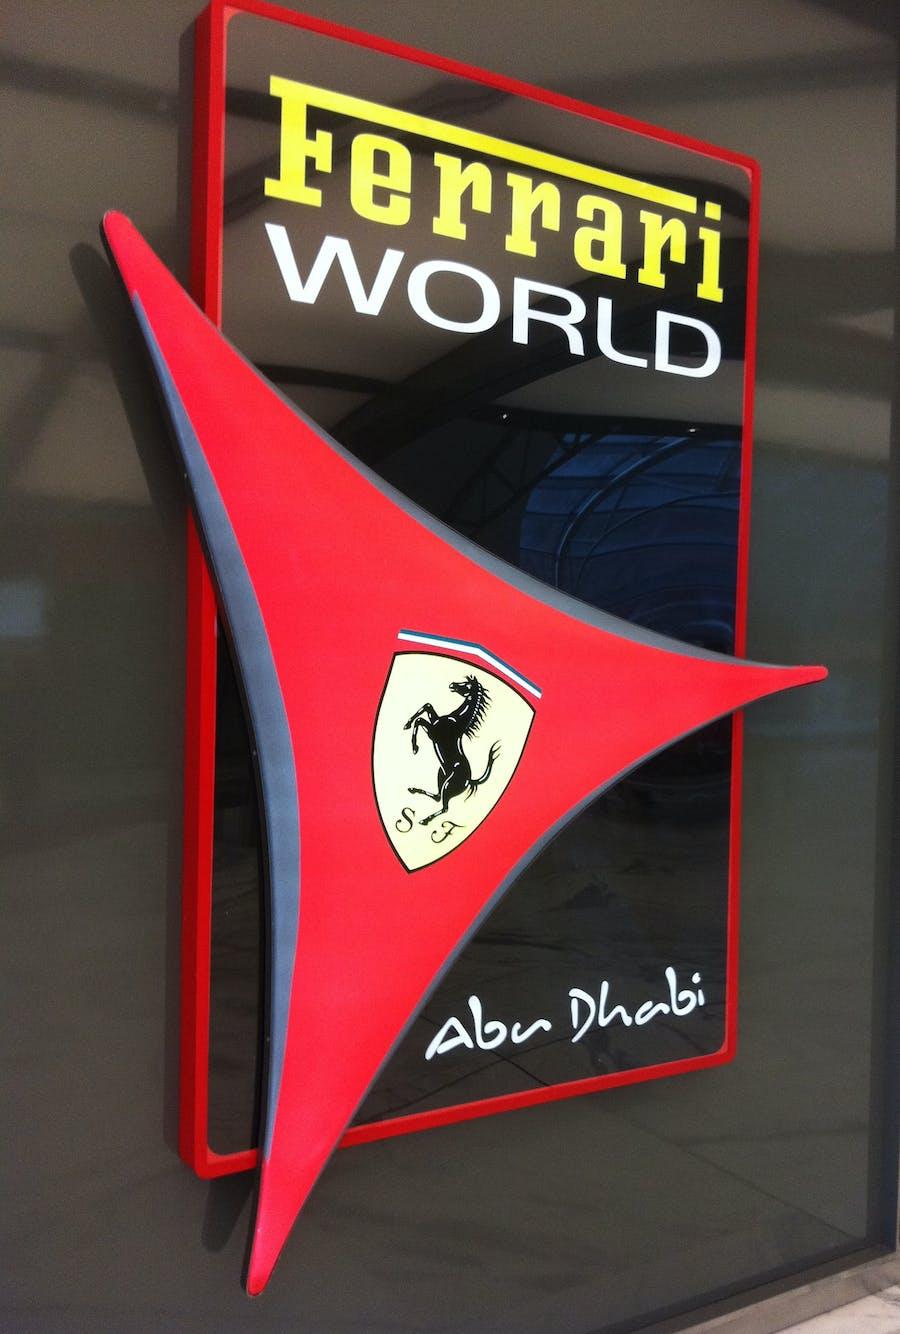 ferrari world abu dhabi tickets with transfer from dubai. Black Bedroom Furniture Sets. Home Design Ideas